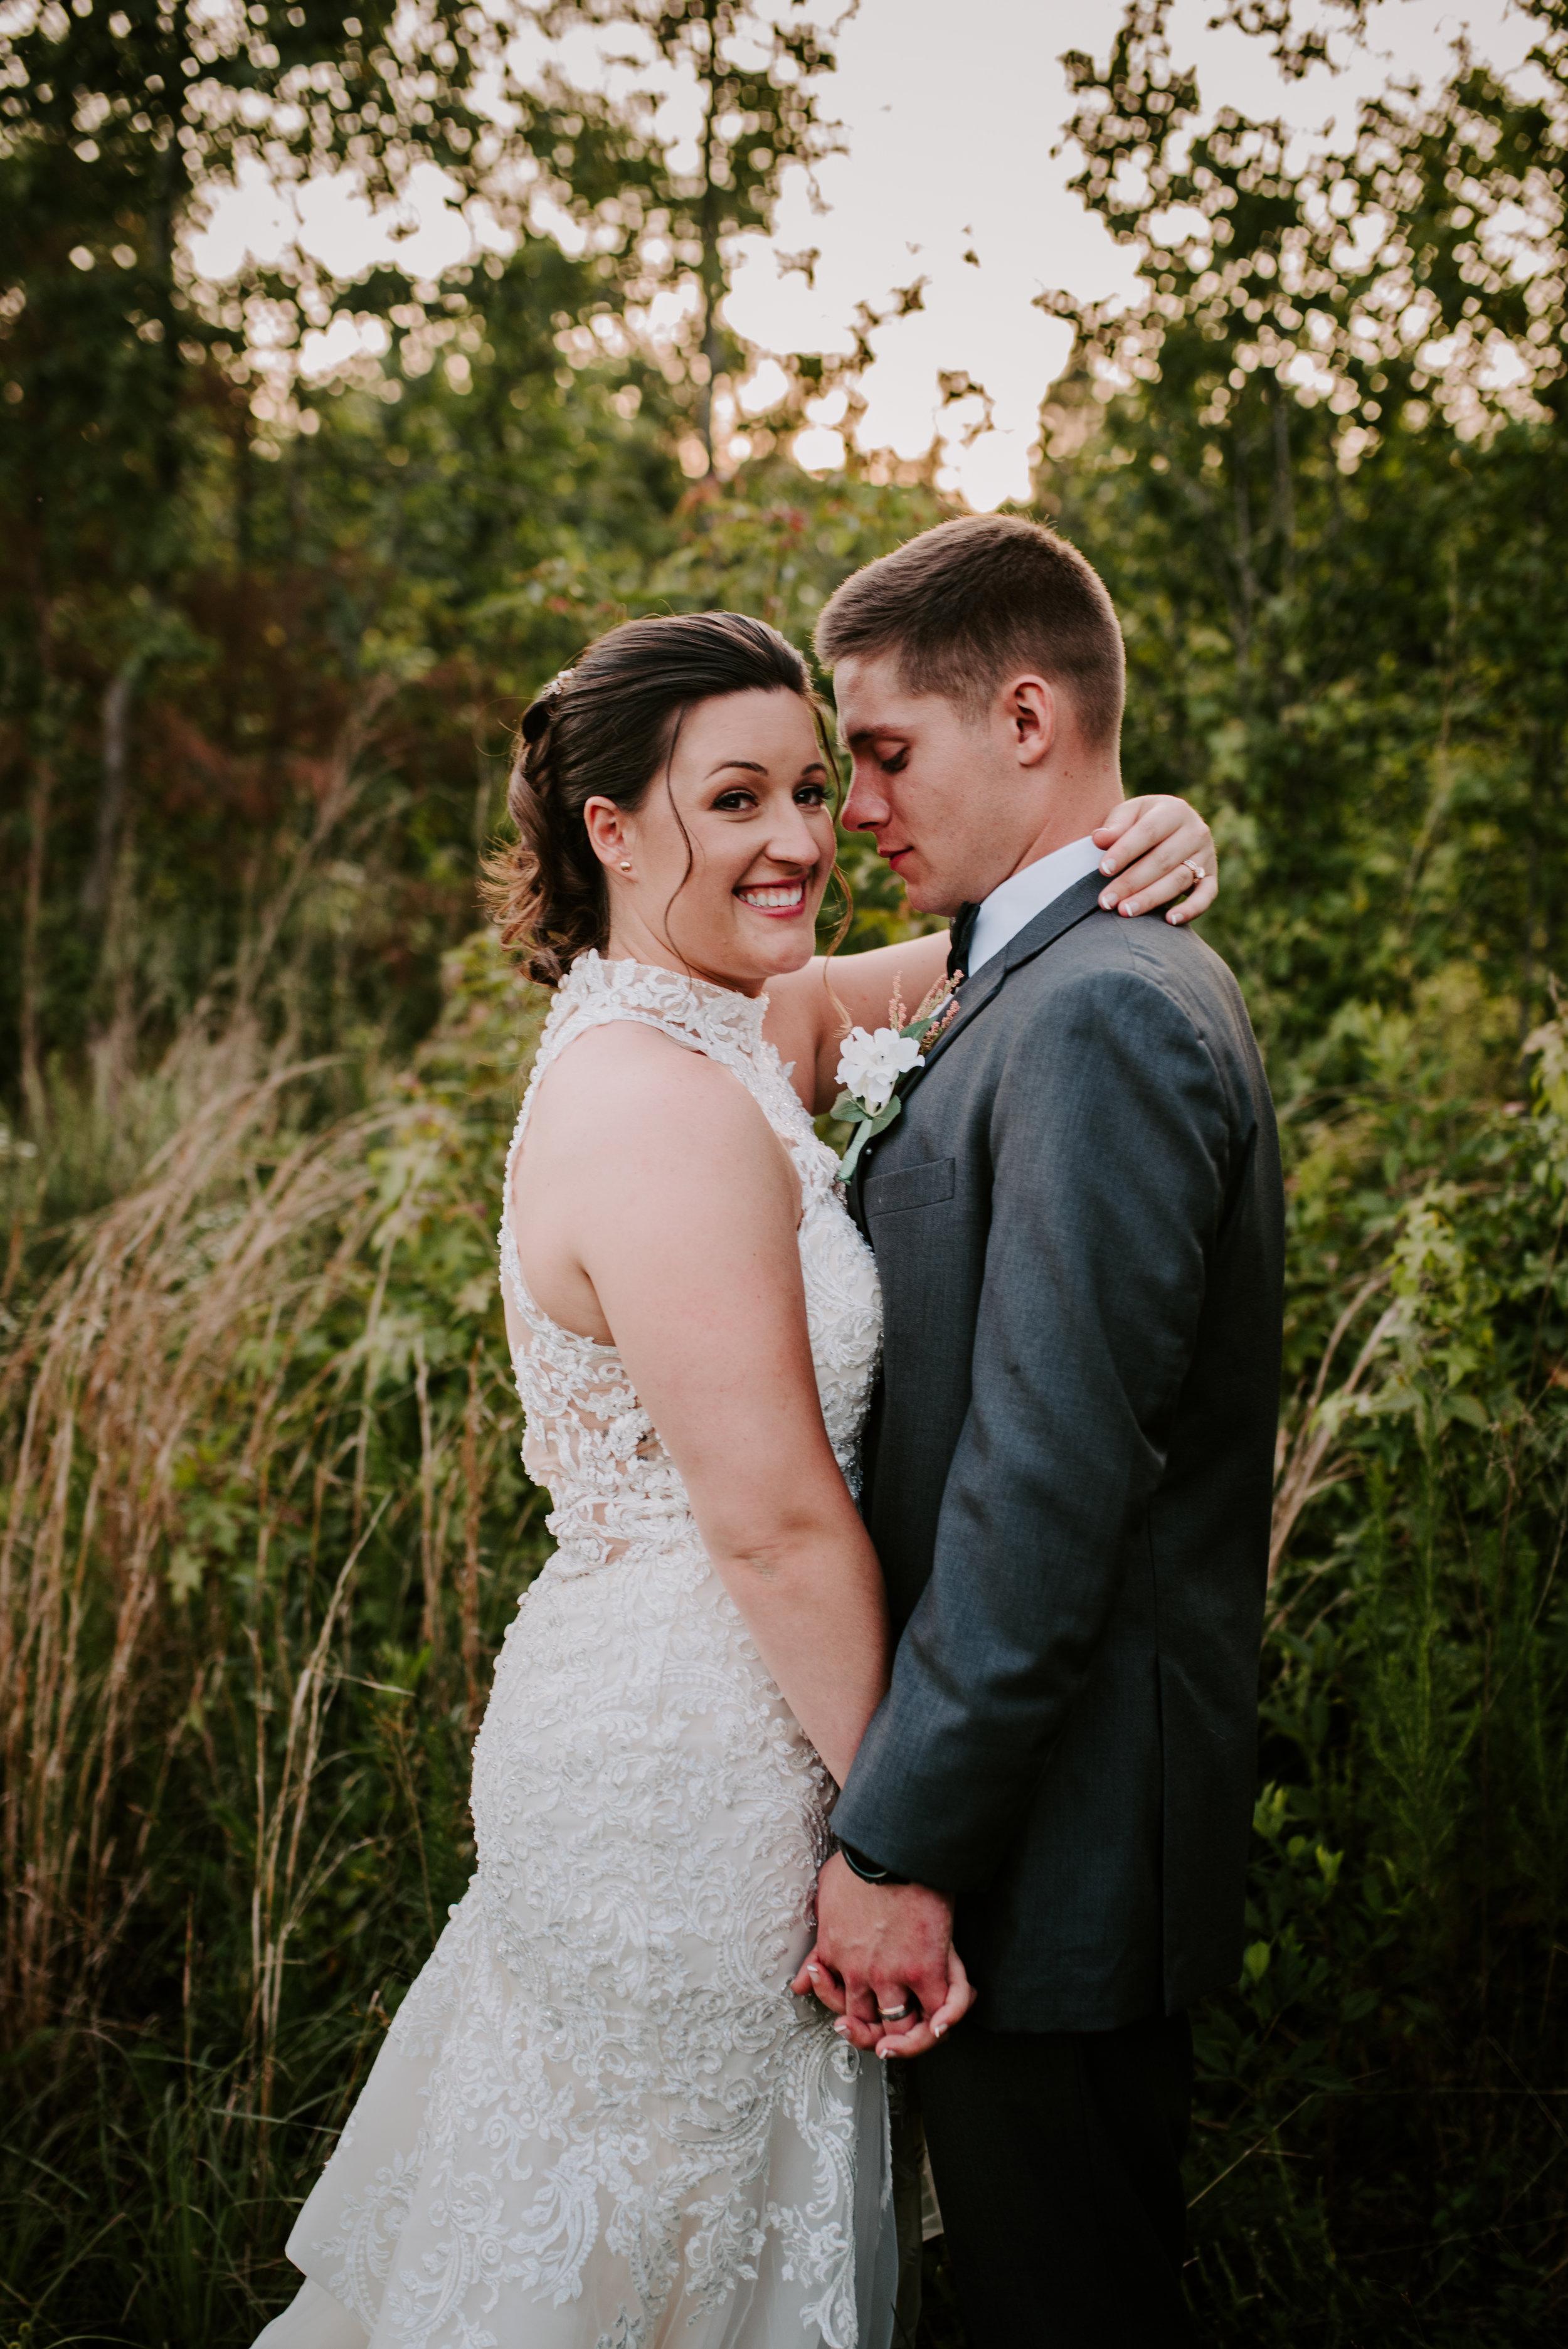 The Pavilion at Carriage Farm - Raleigh Wedding - North Carolina Wedding  Photographer - Raleigh Wedding Photographer